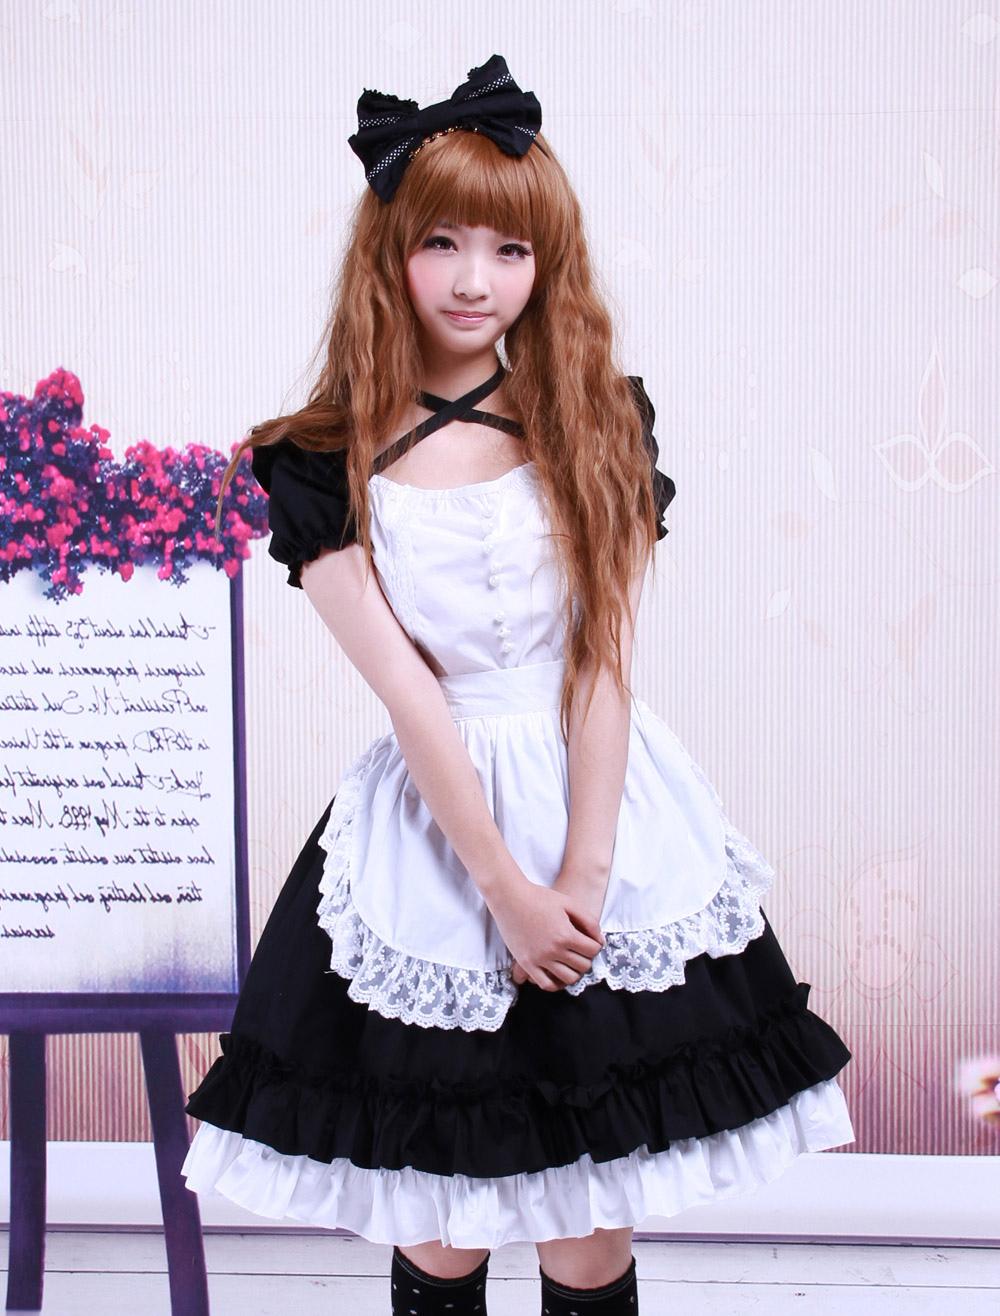 White apron lace trim - Lolitashow Sweet Black Cotton Maid Lolita One Piece White Apron Short Sleeves Lace Trim Lolitashow Com